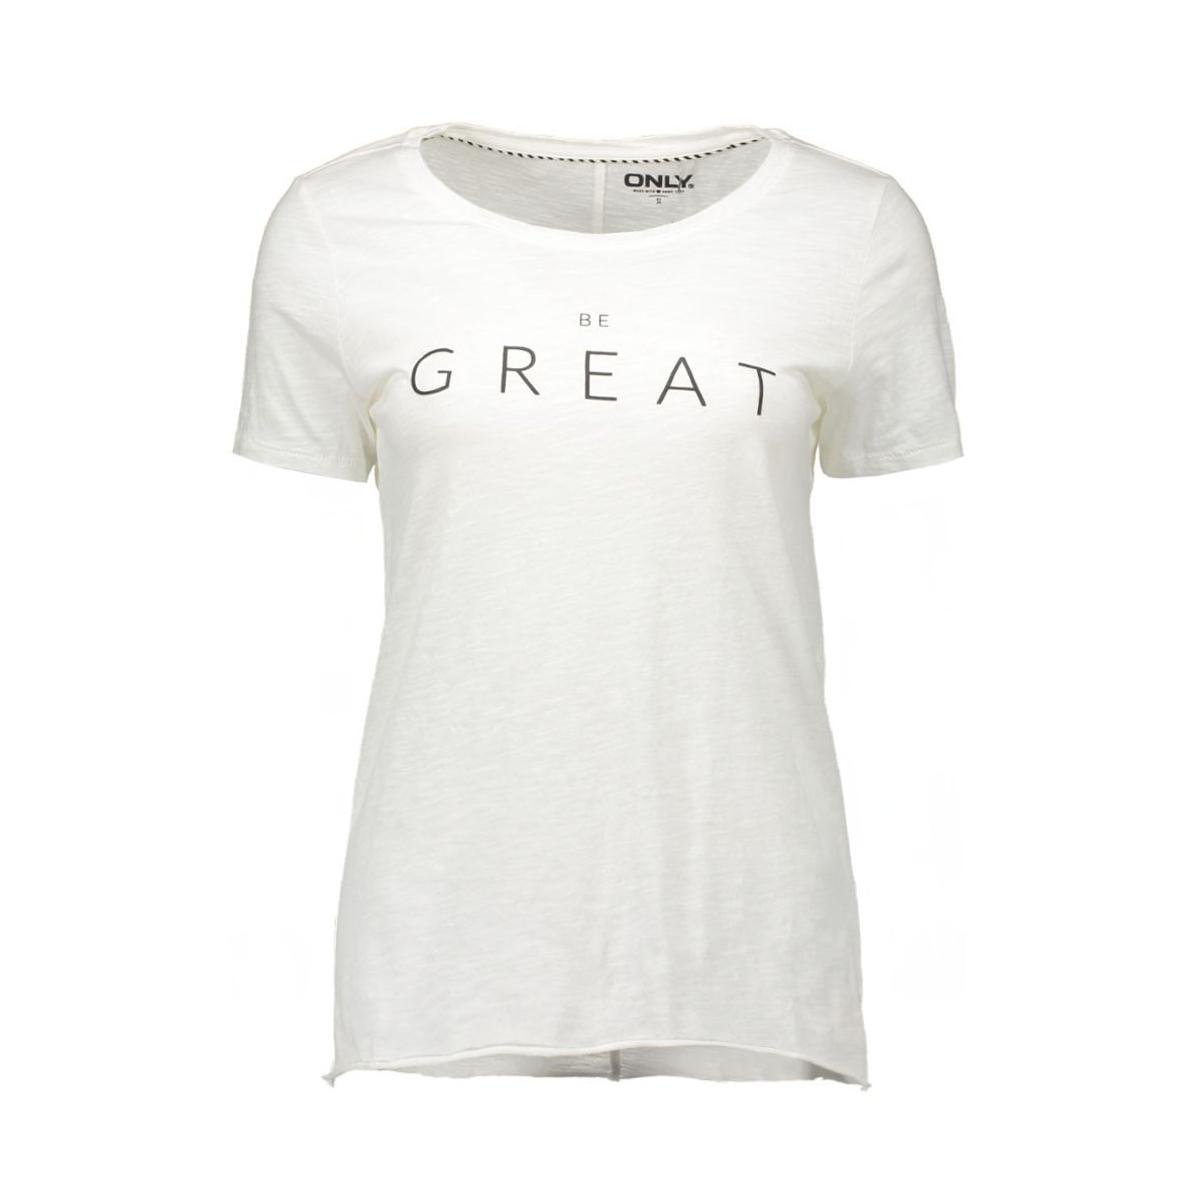 onlbone s/s raw print top box ess2 15127055 only t-shirt cloud dancer/great